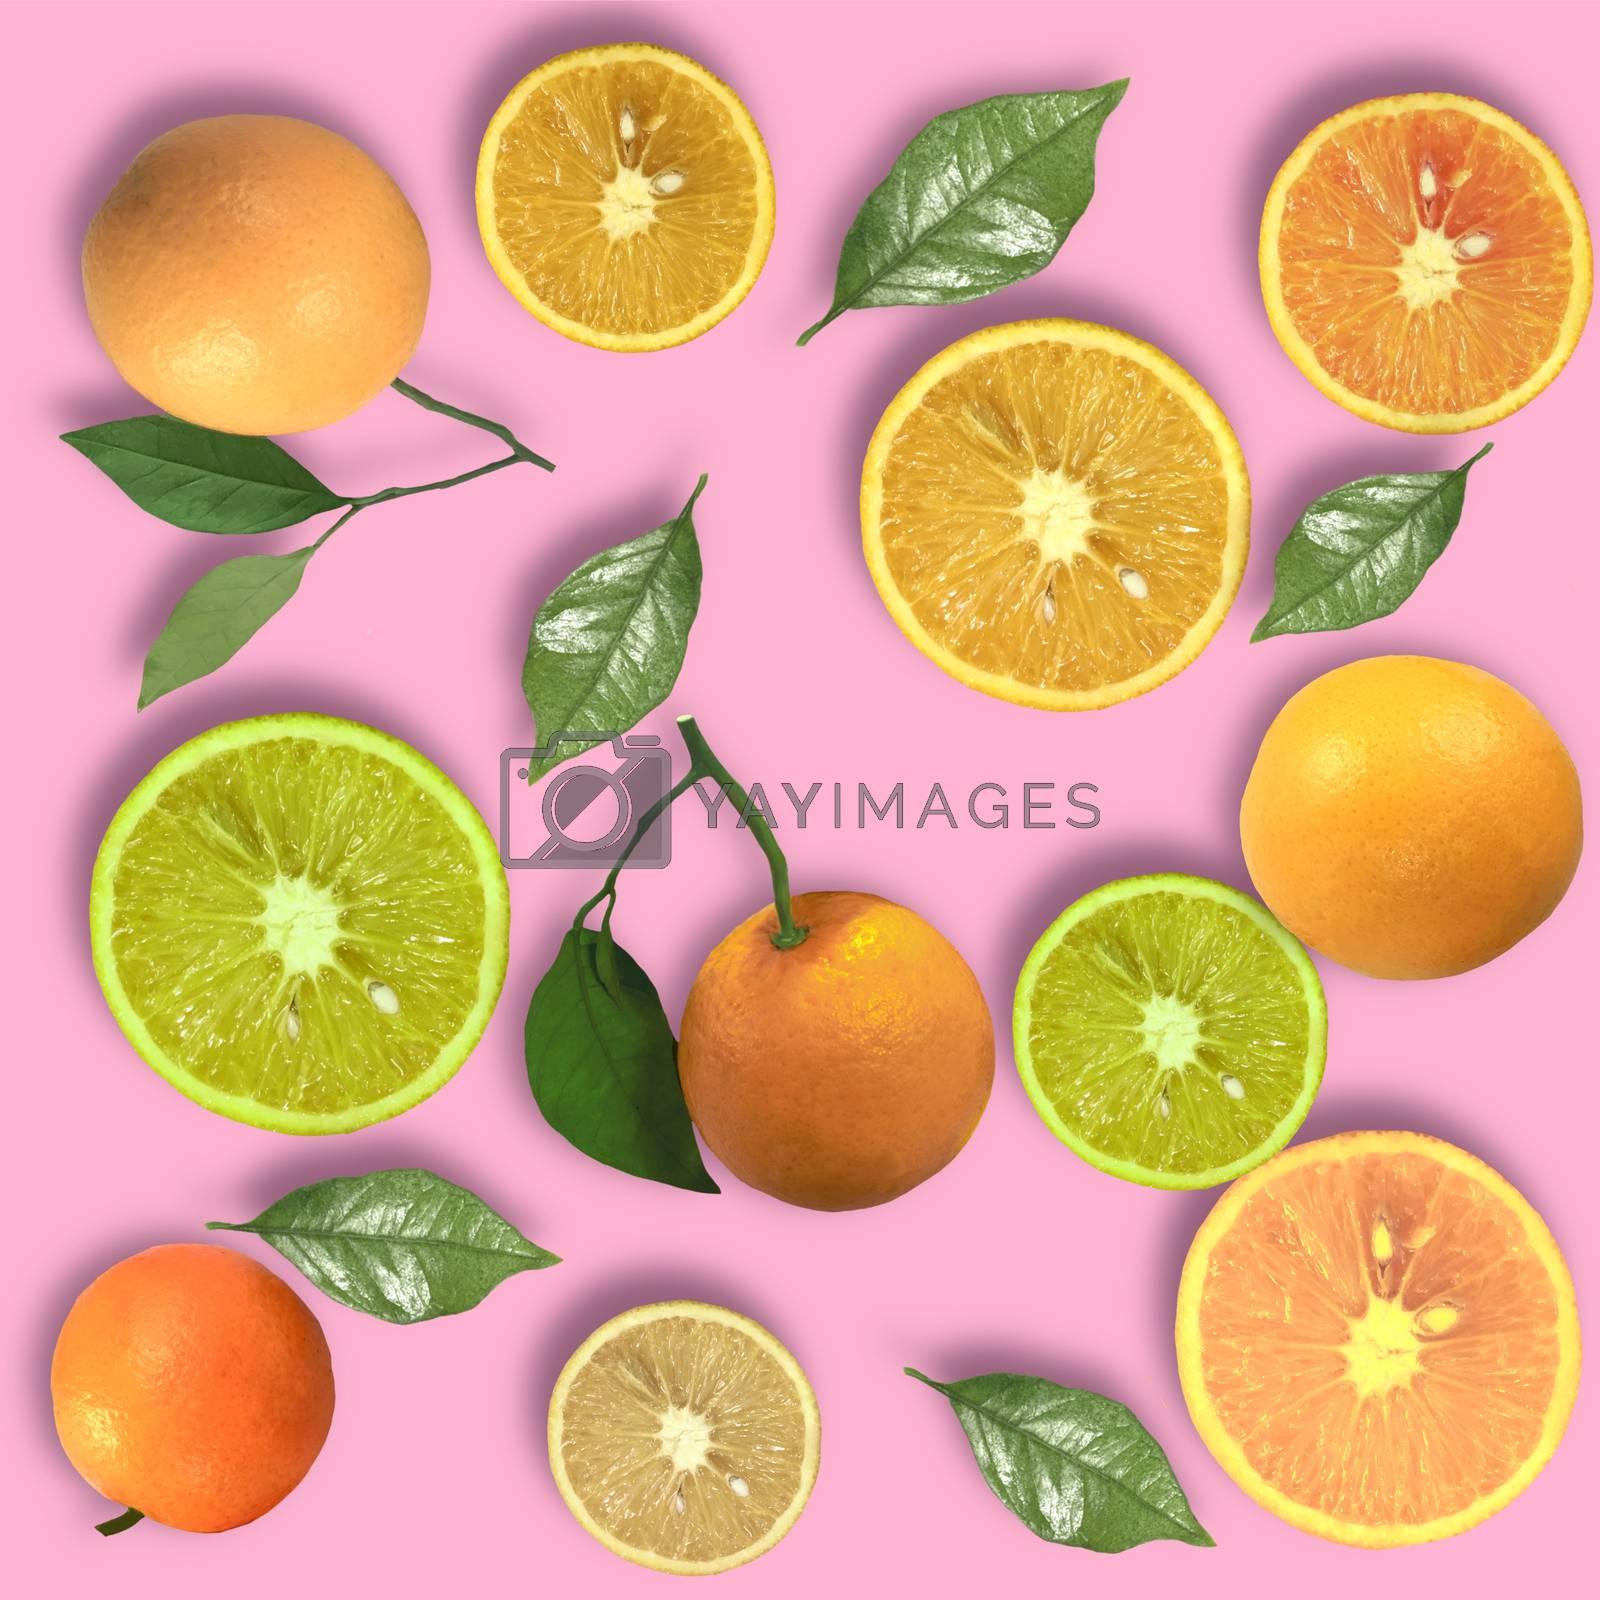 Colorful fruit background of fresh orange slices. Top view whole orange and half of orange.